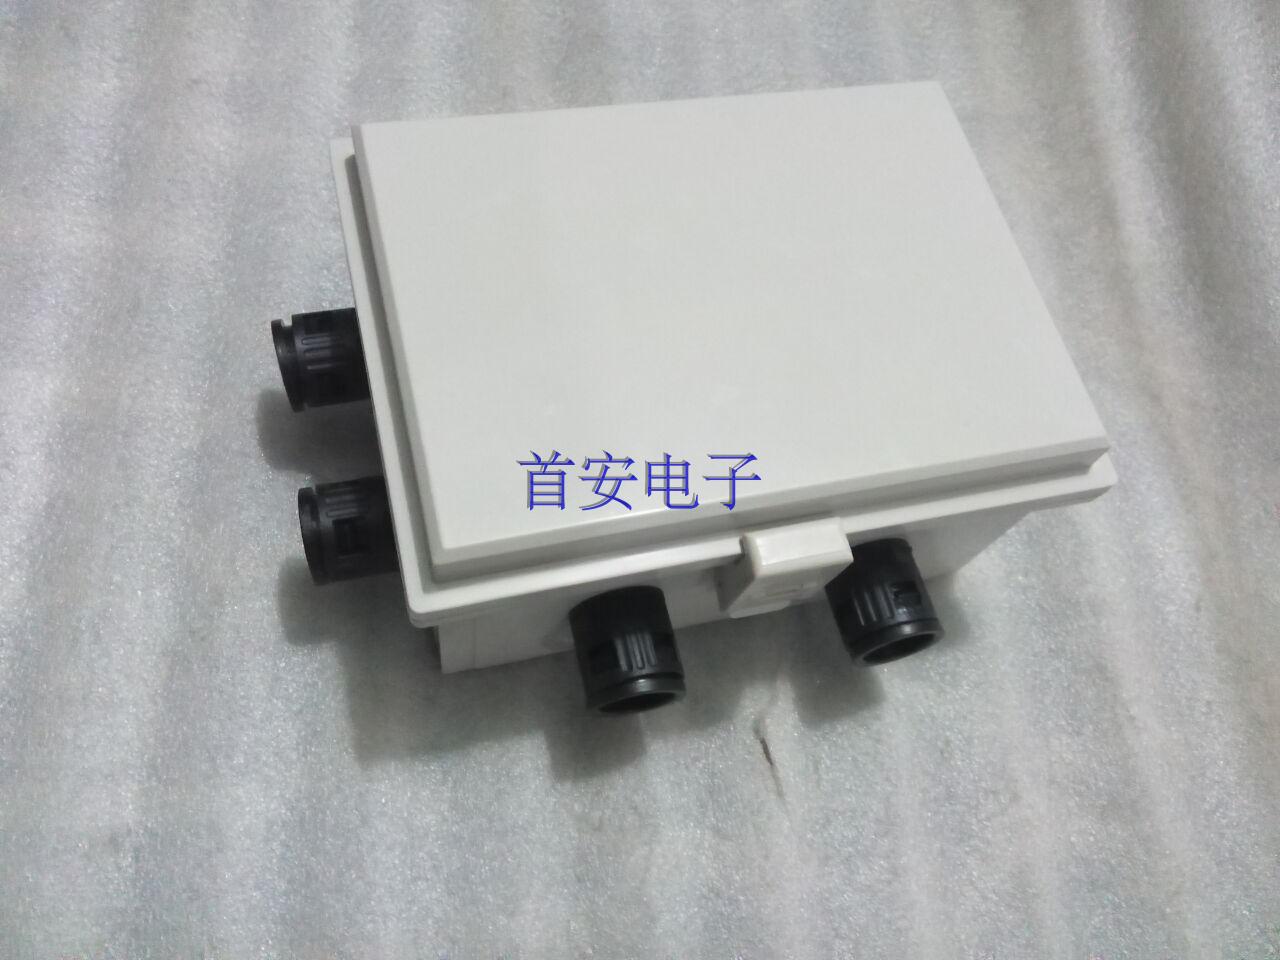 Hose threading waterproof box, 200*150*100 terminal junction box, plastic hinge hasp, junction box, waterproof box